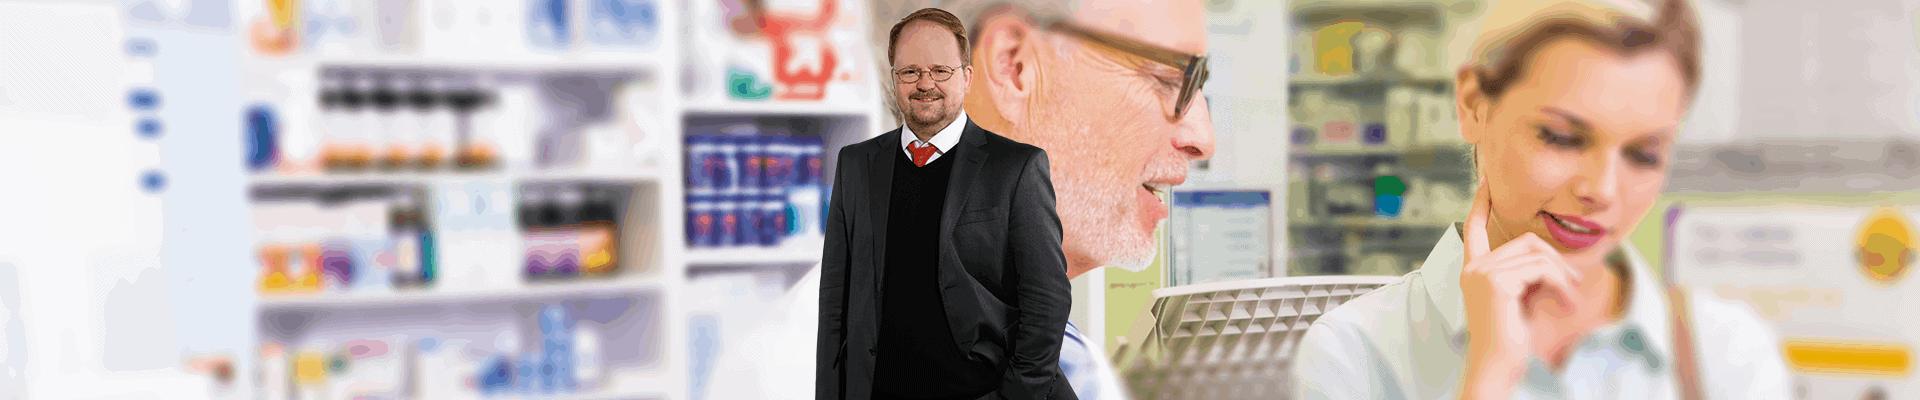 Diplom Finanzwirt Stefan Eichblatt Unternehmensberatung Göttingen